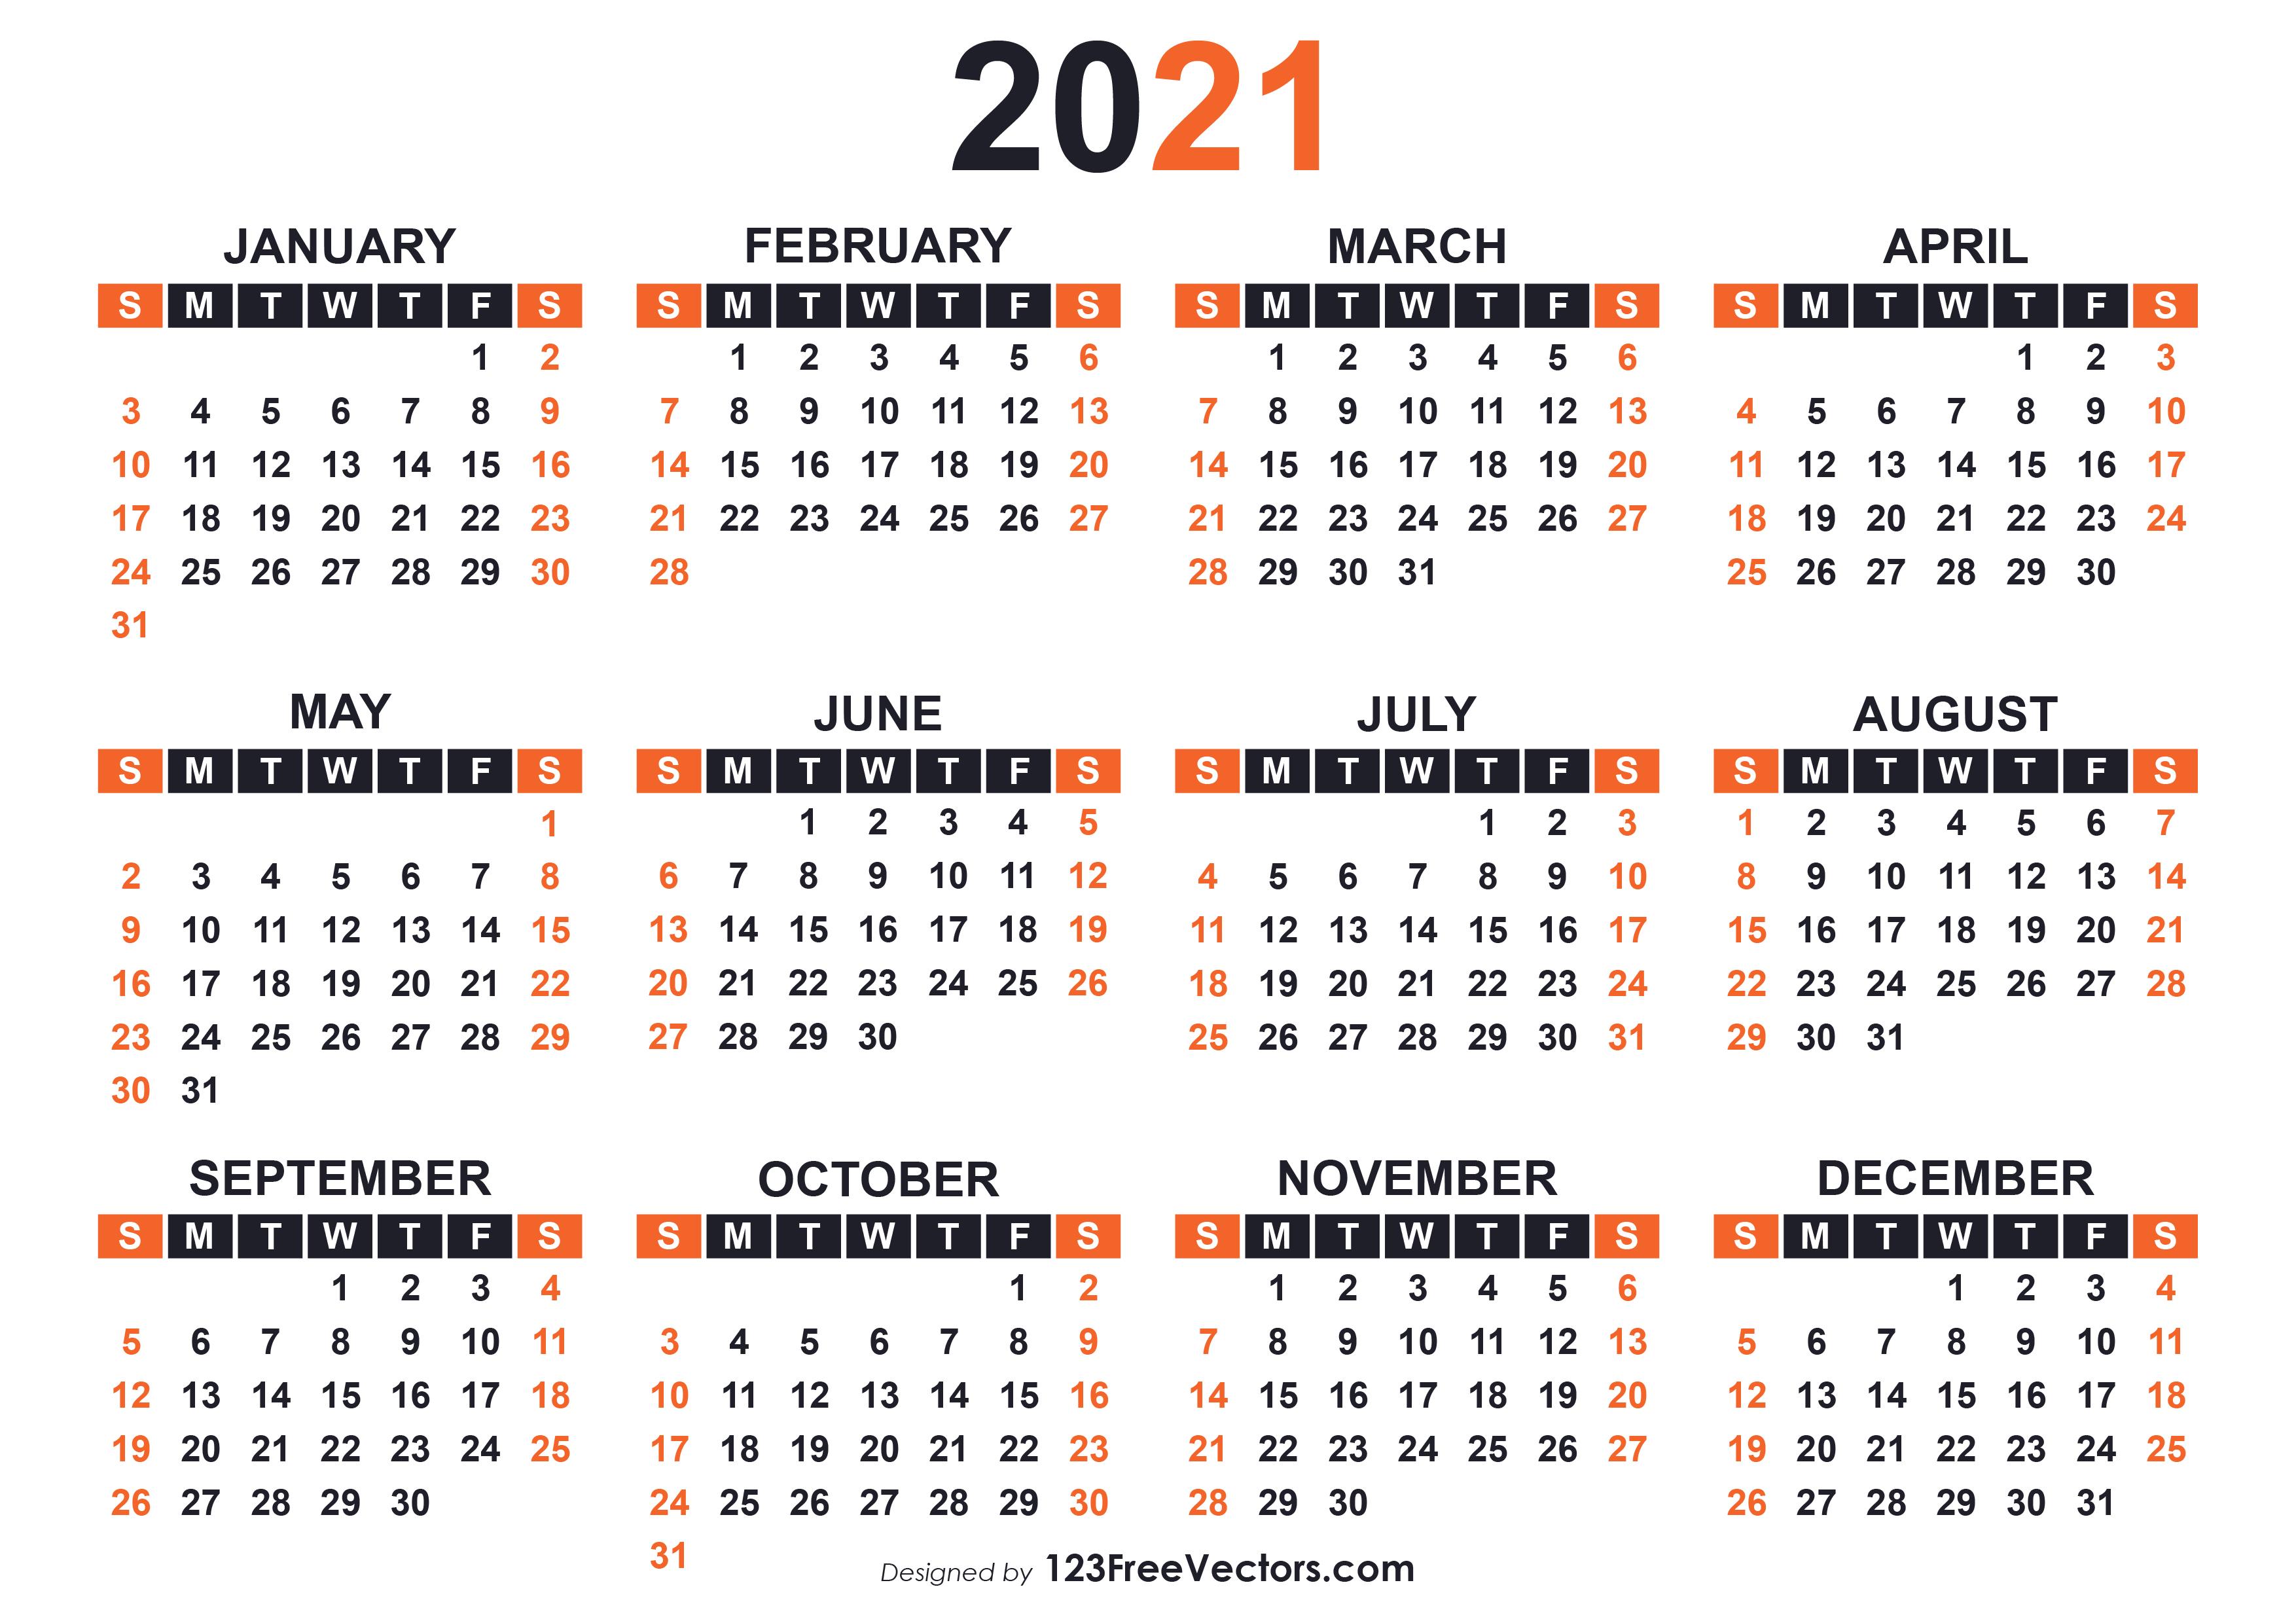 2021 Calendar Editable Free - Free Vector Illustrated 2021 ...